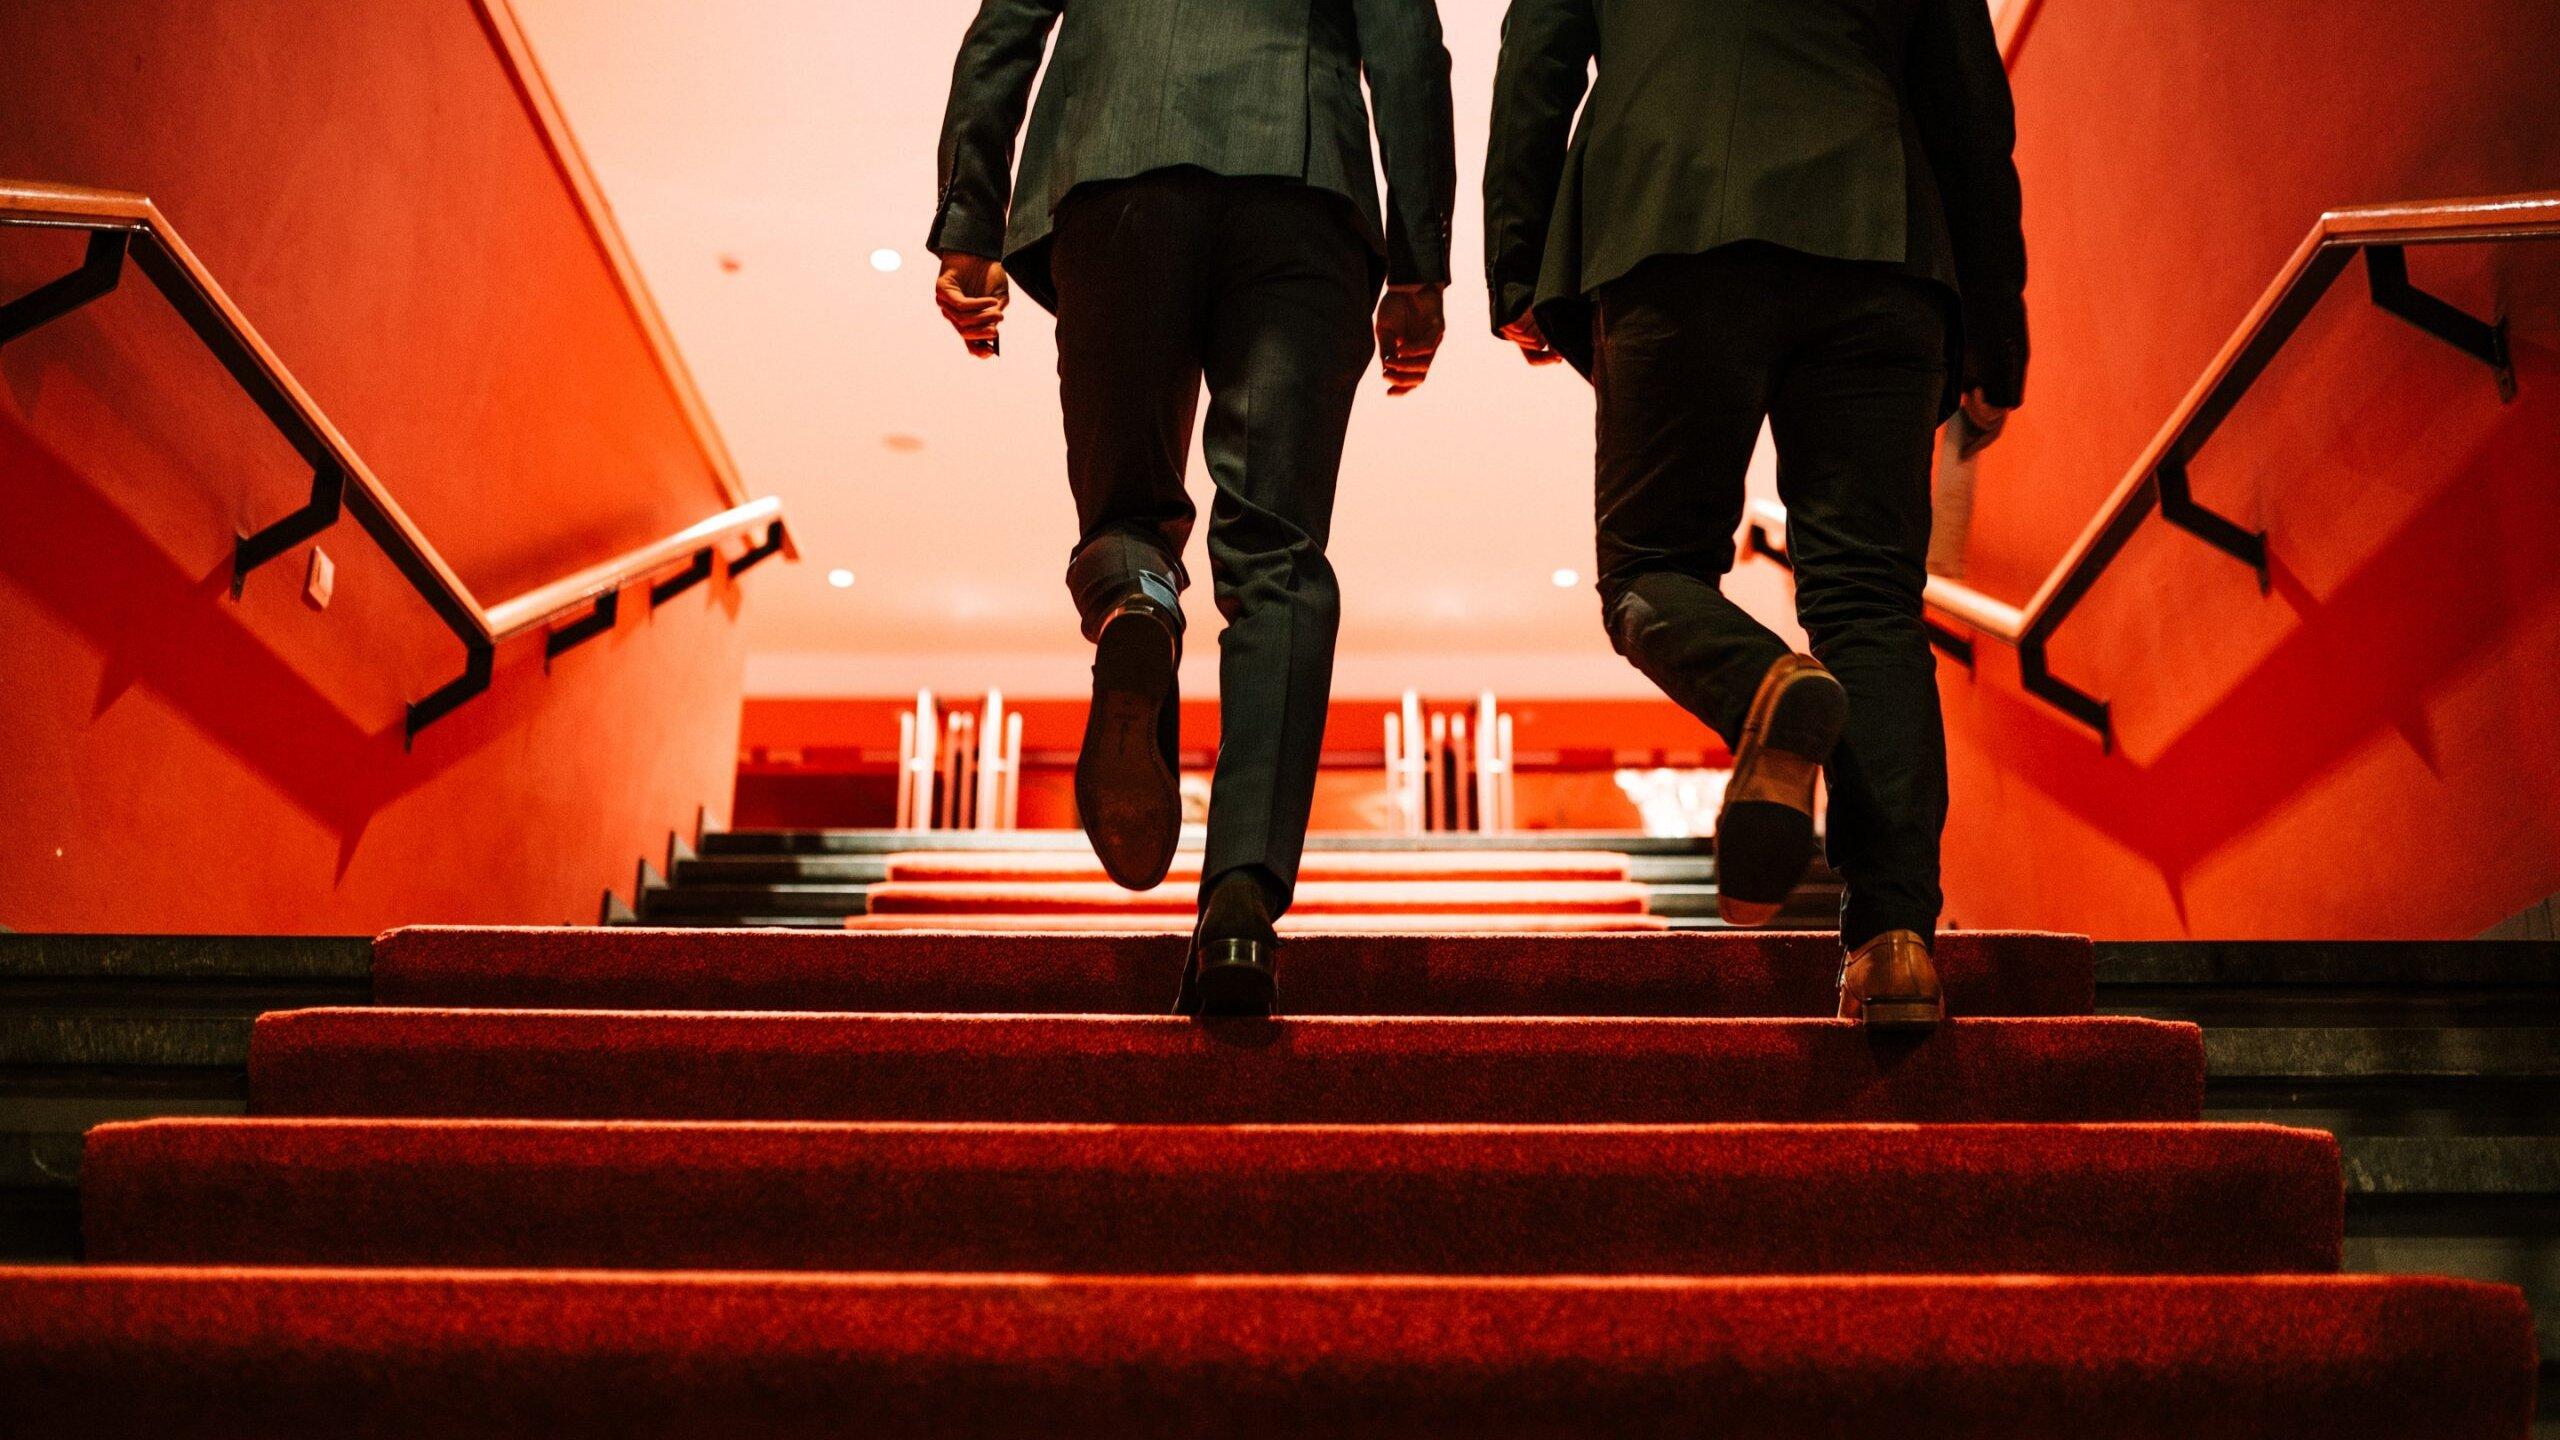 twee mannen in pak lopen trap op in het martiniplaza